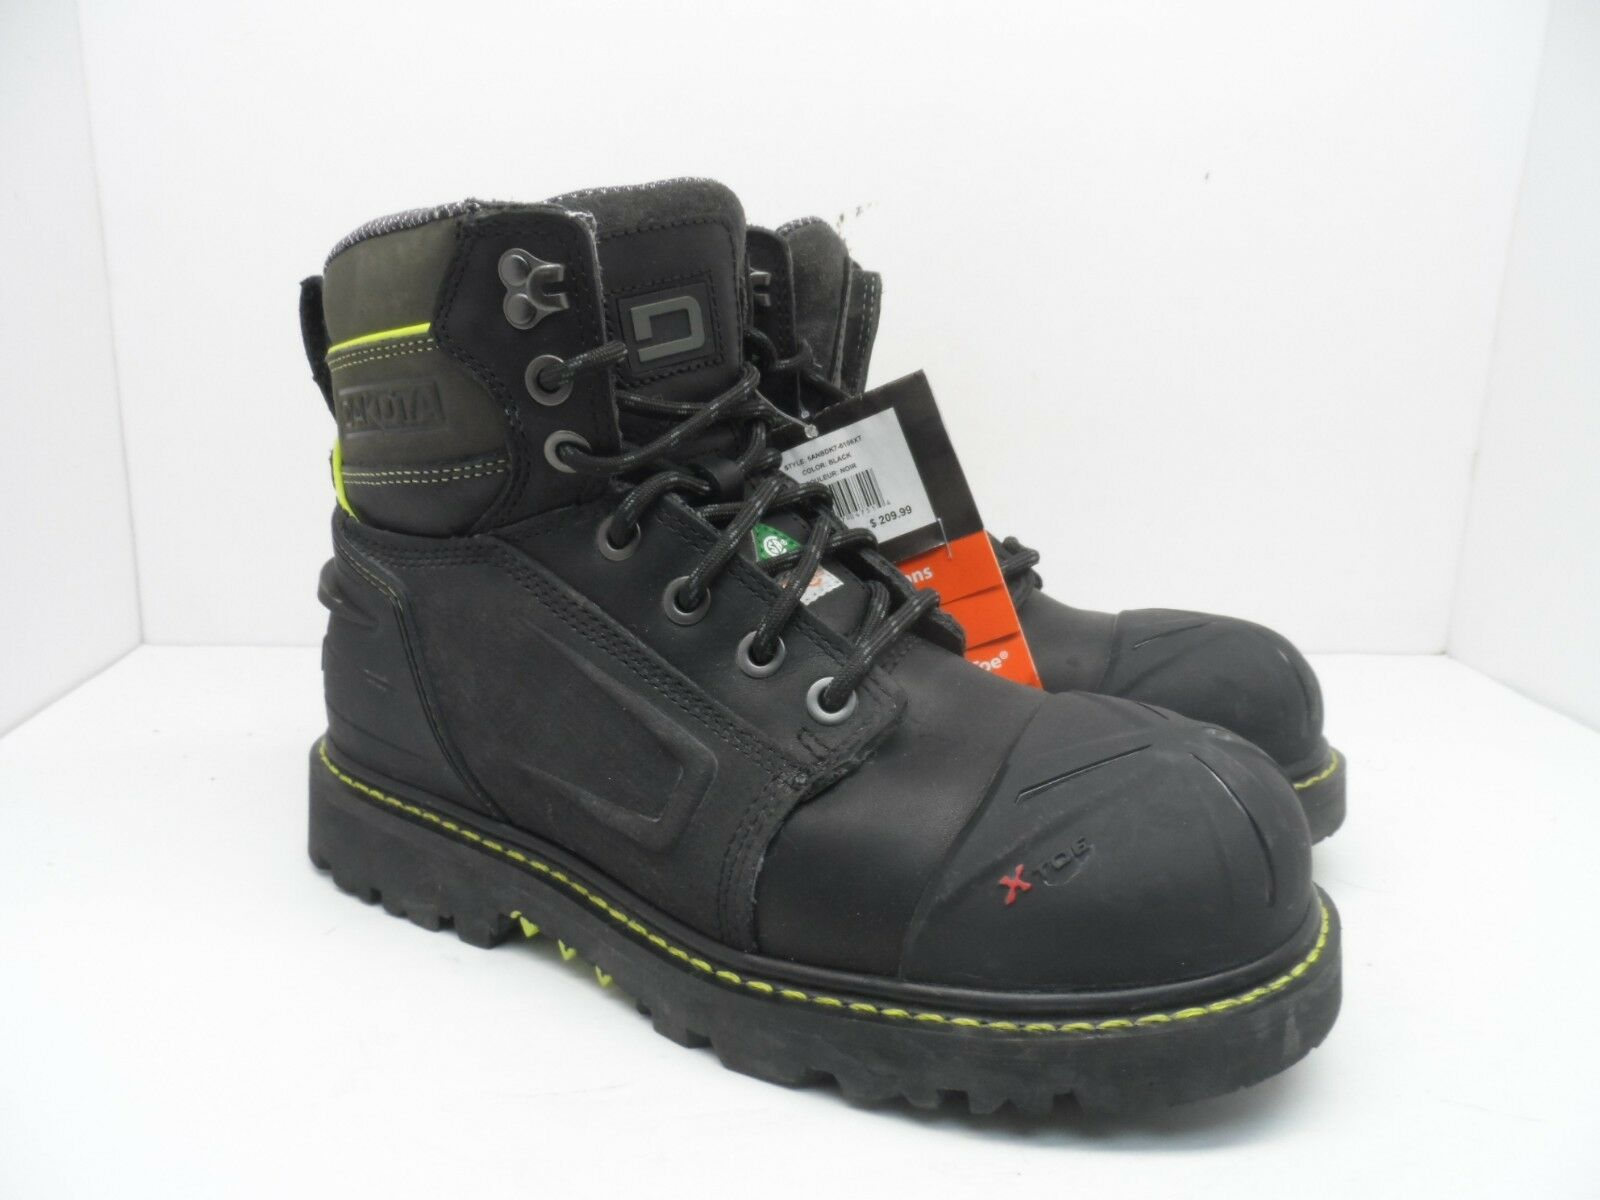 Dakota Men's 6'' X-Toe Quad Comfort Steel Toe Composite Plate Boots Black 8.5M